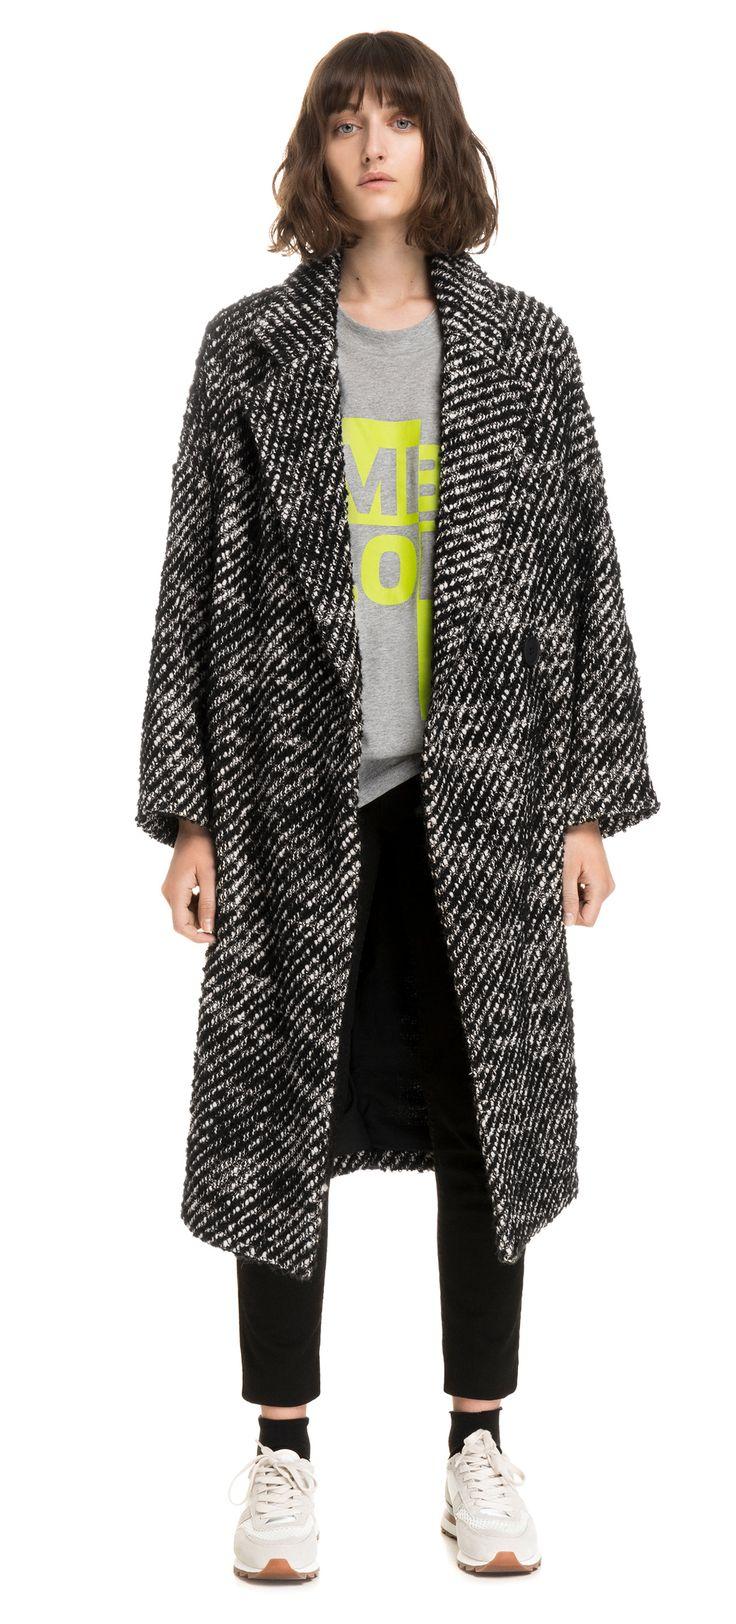 Manteau oversize bicolore | BIMBA Y LOLA ®